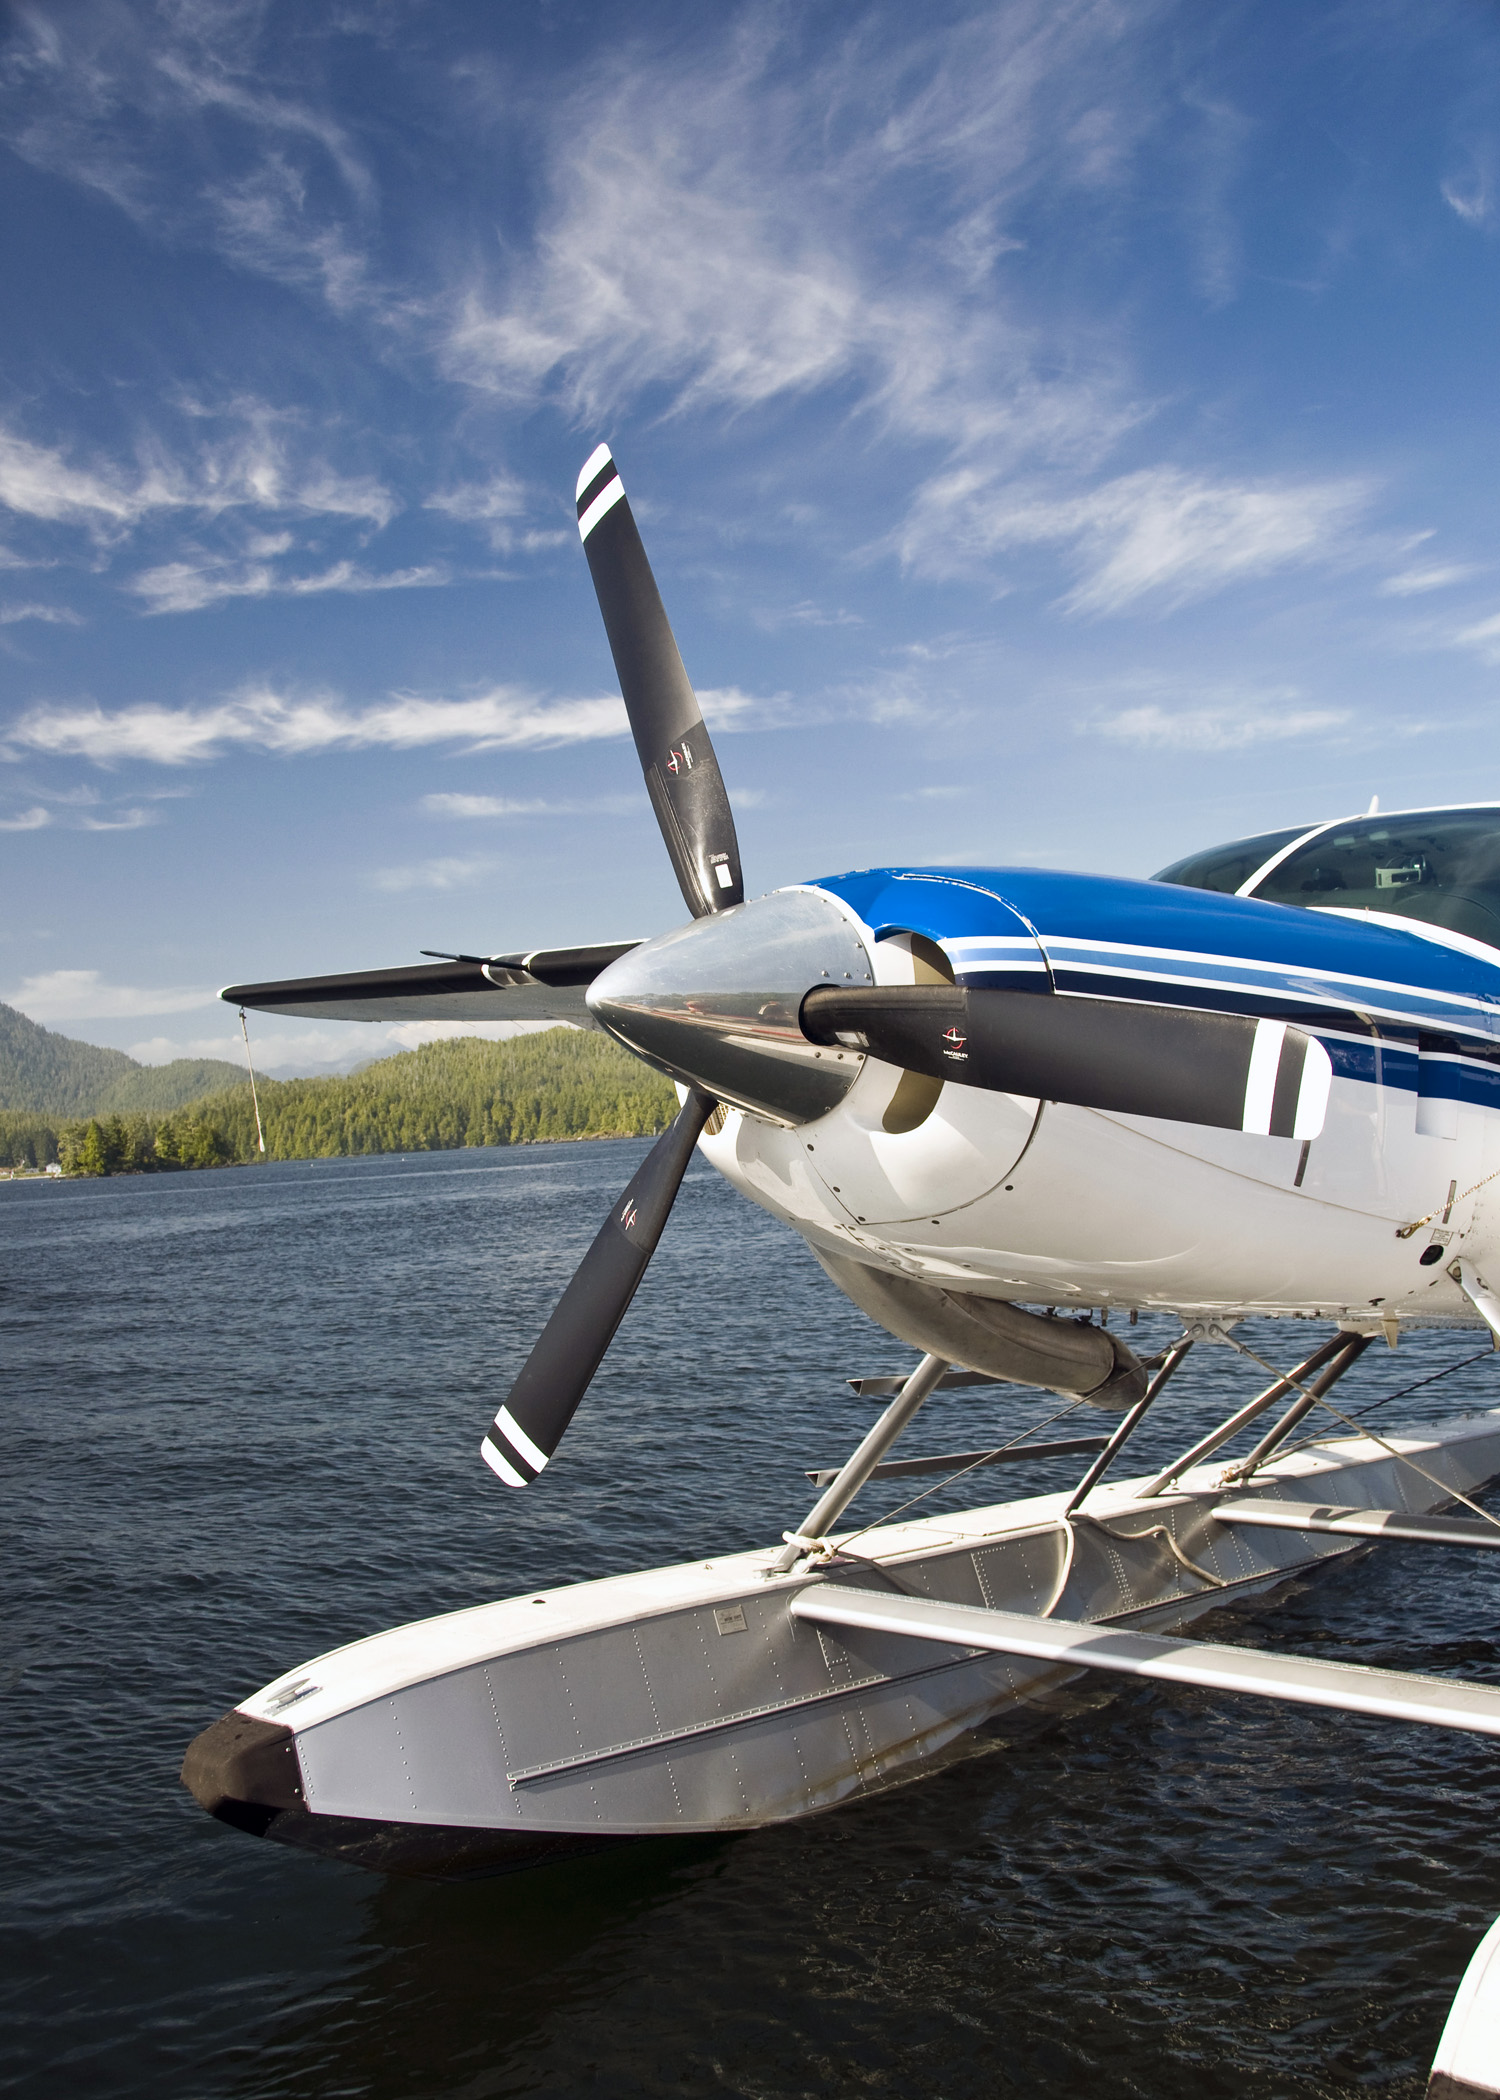 Sea Plane (Kenmore Air)